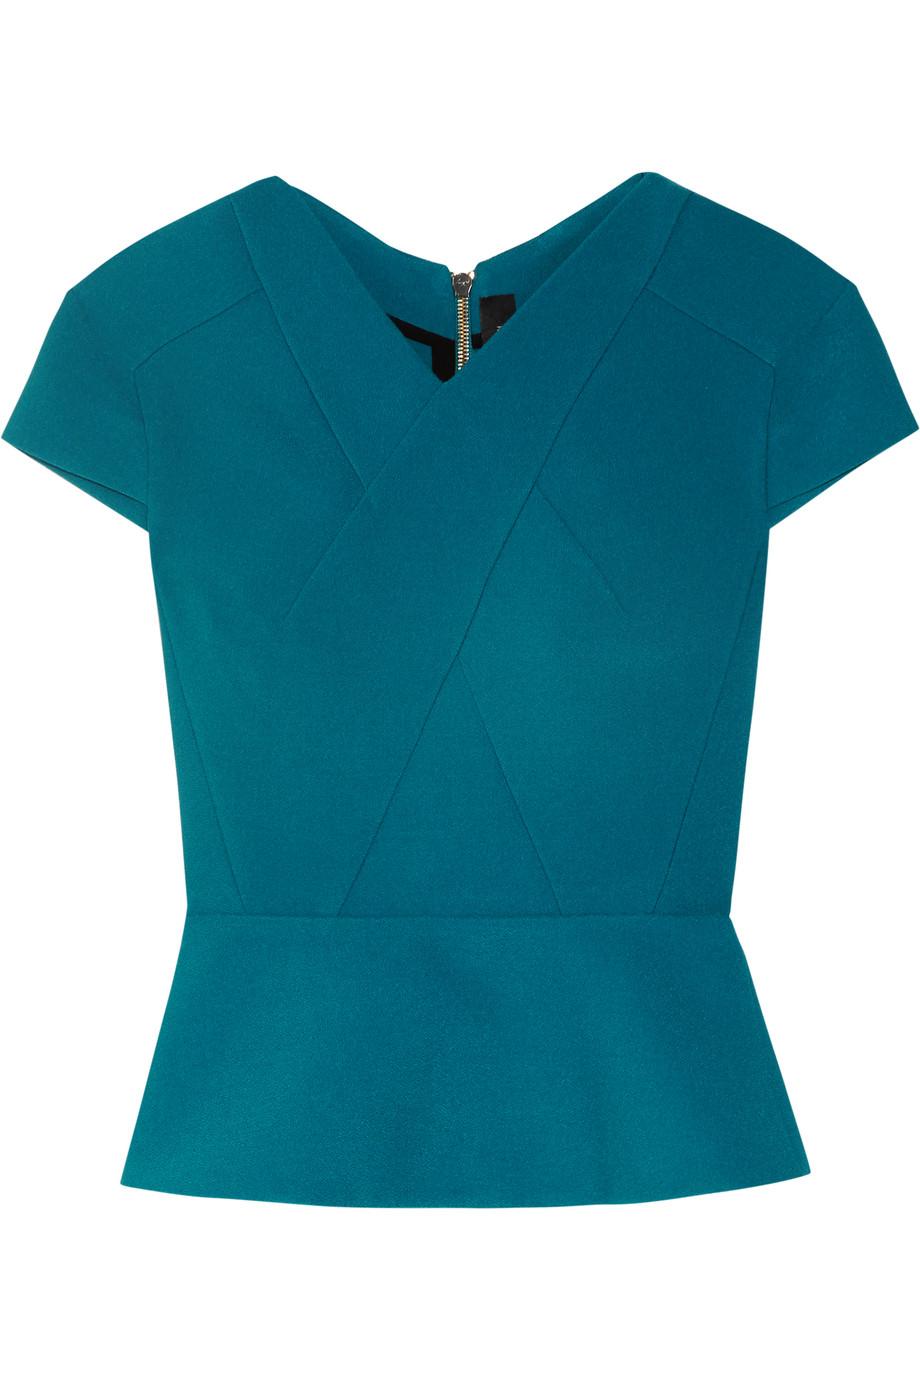 Roland Mouret Begbie Paneled Wool-Crepe Top, Petrol, Women's, Size: 10